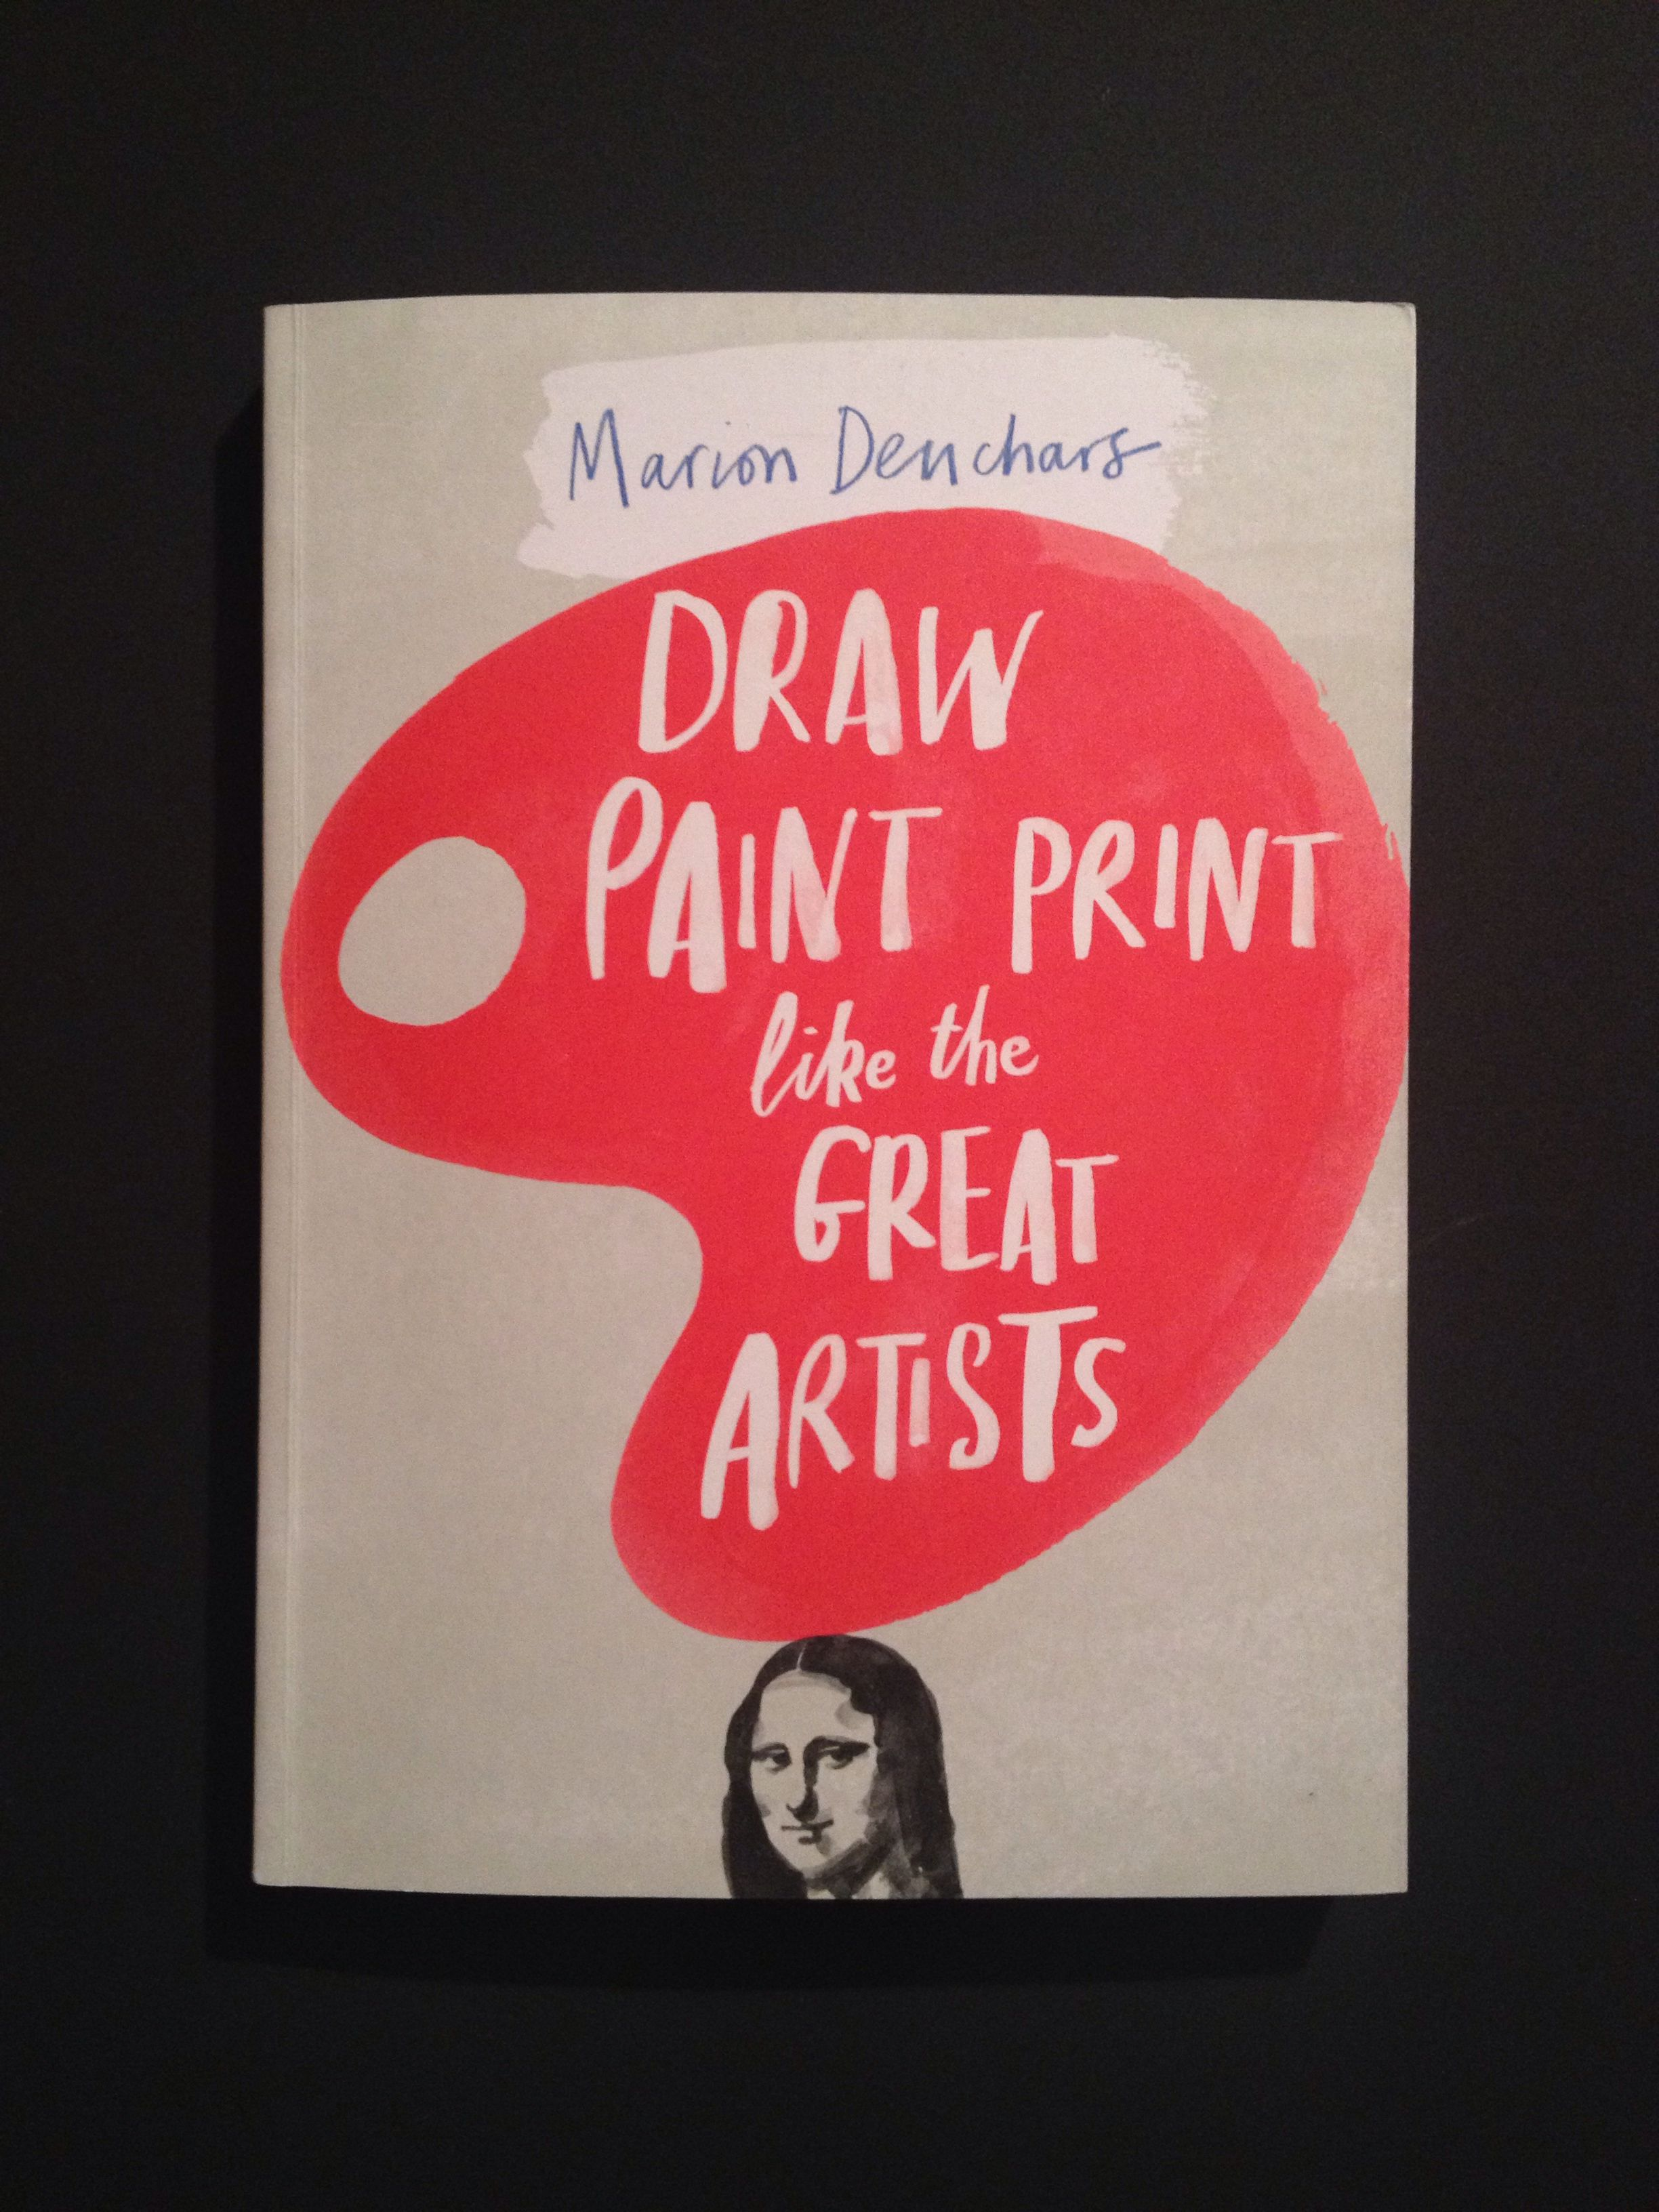 Draw paint print like the great artist - Marcel Denchars